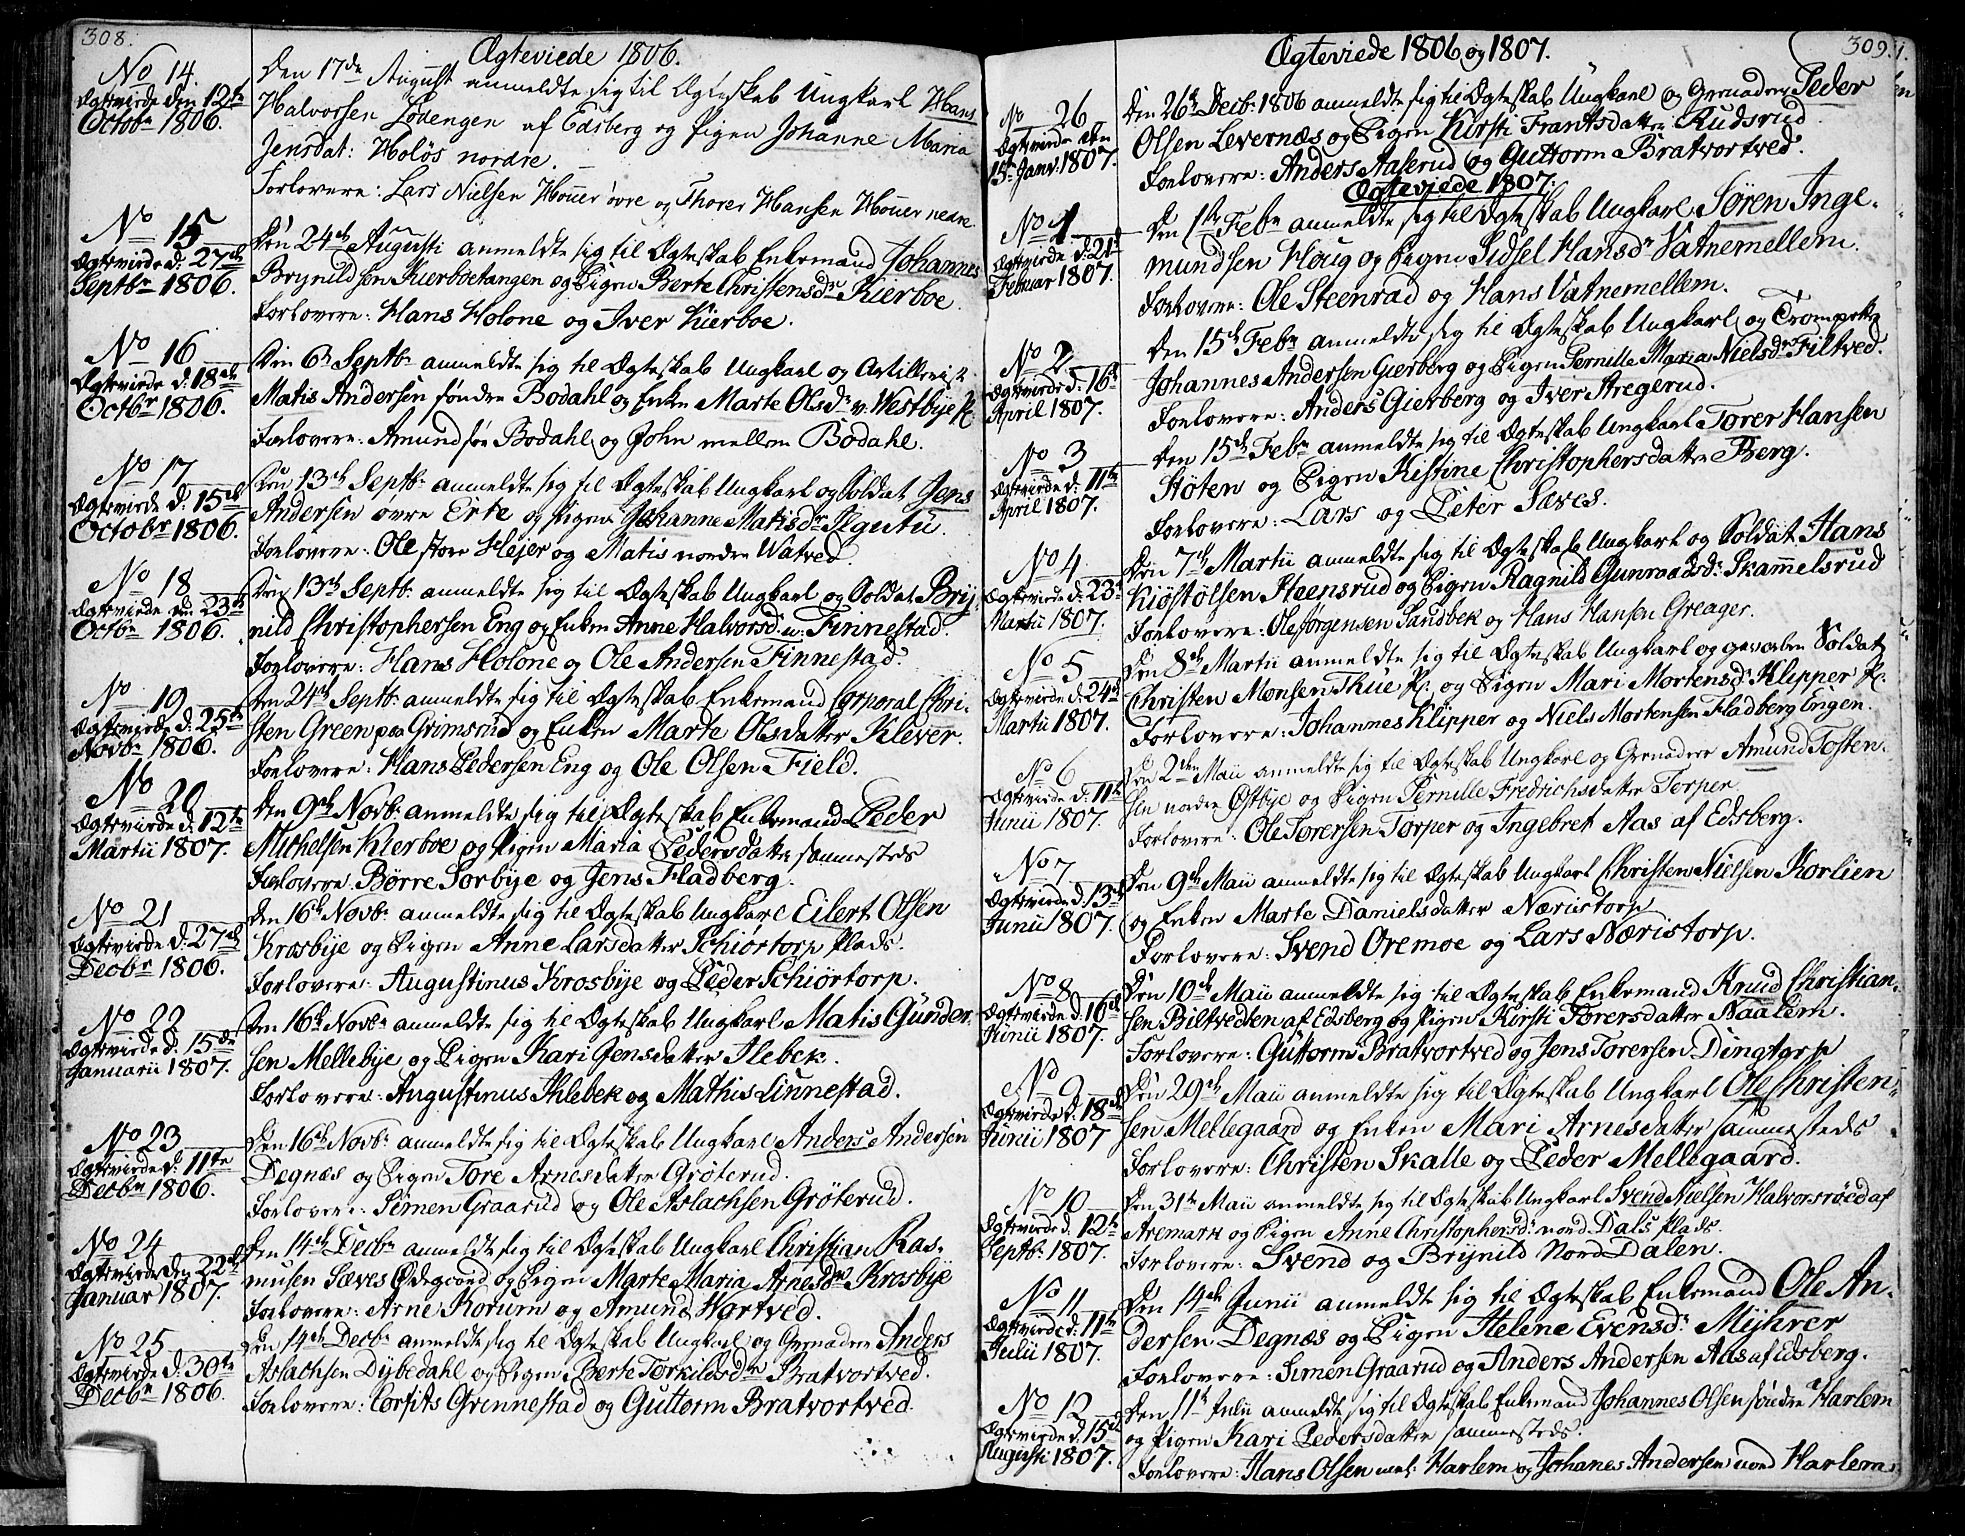 SAO, Rakkestad prestekontor Kirkebøker, F/Fa/L0005: Ministerialbok nr. I 5, 1784-1814, s. 308-309